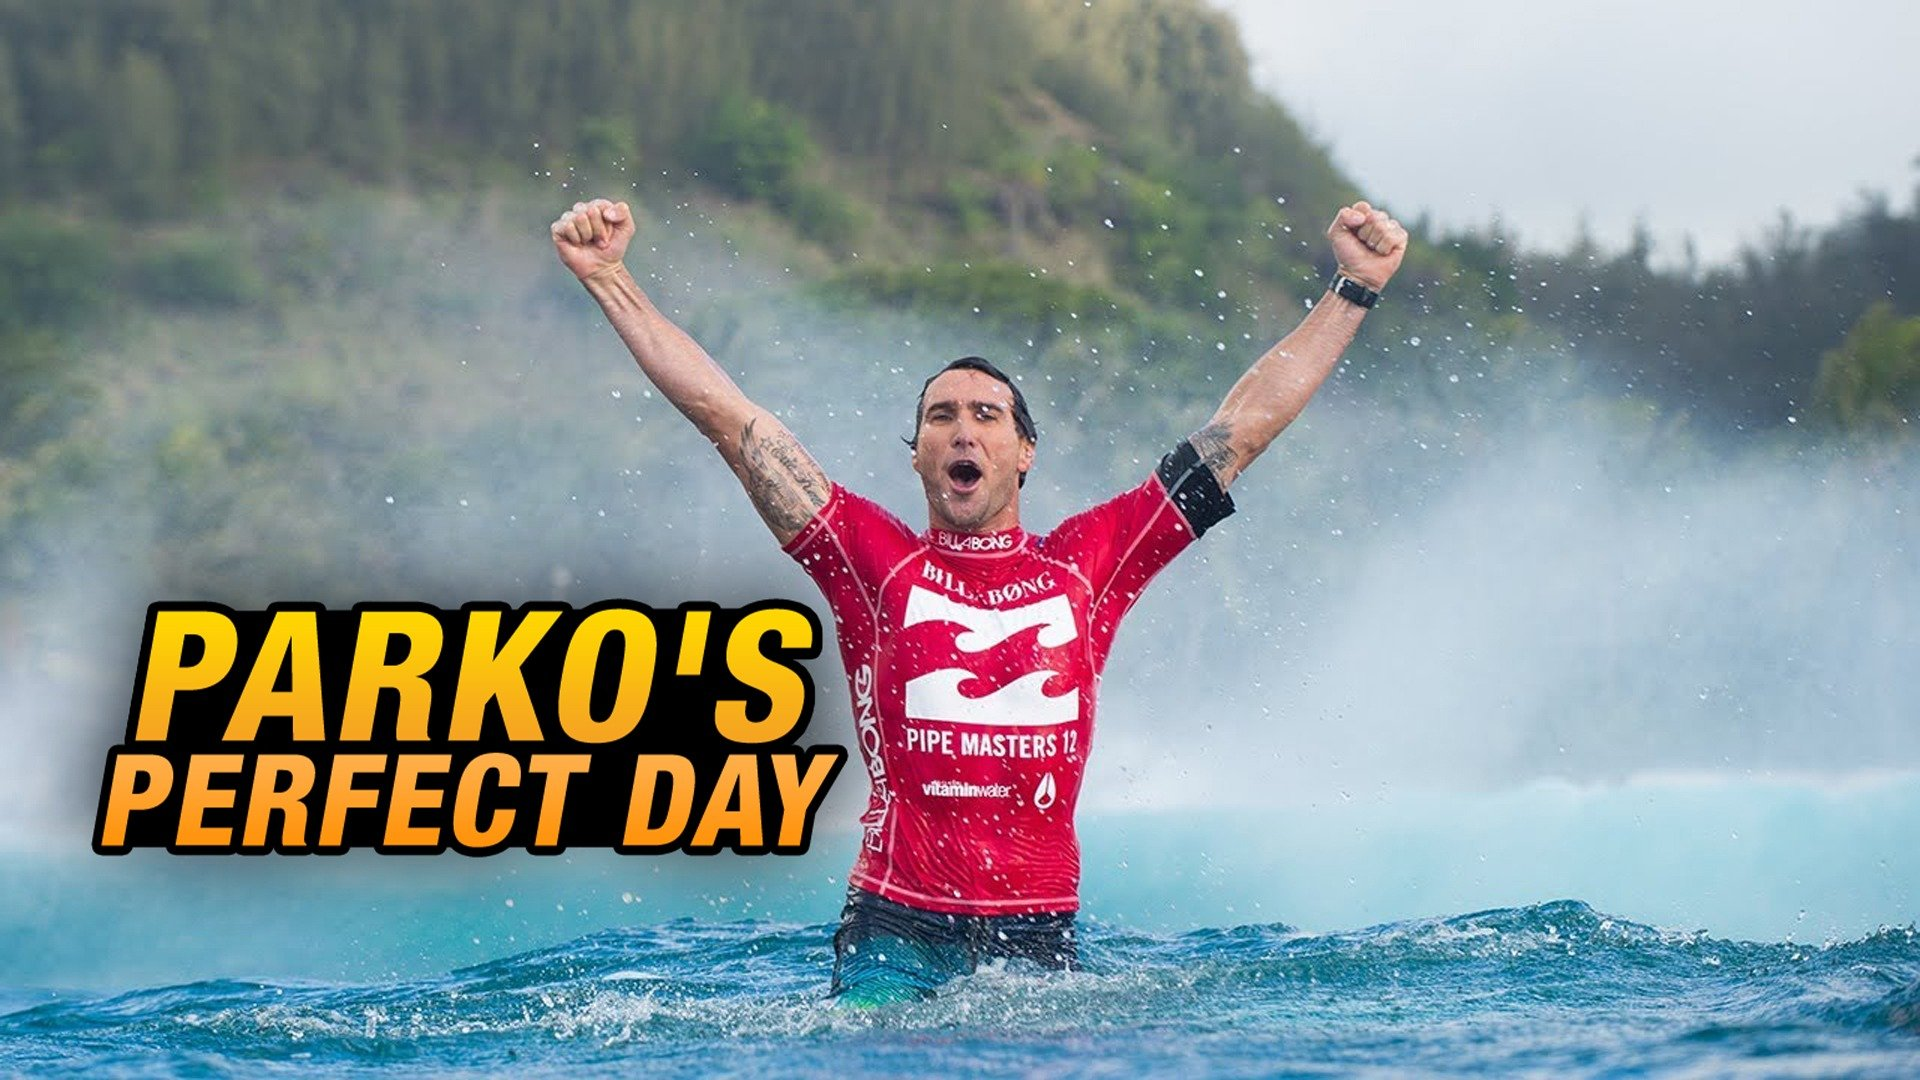 Parko's Perfect Day